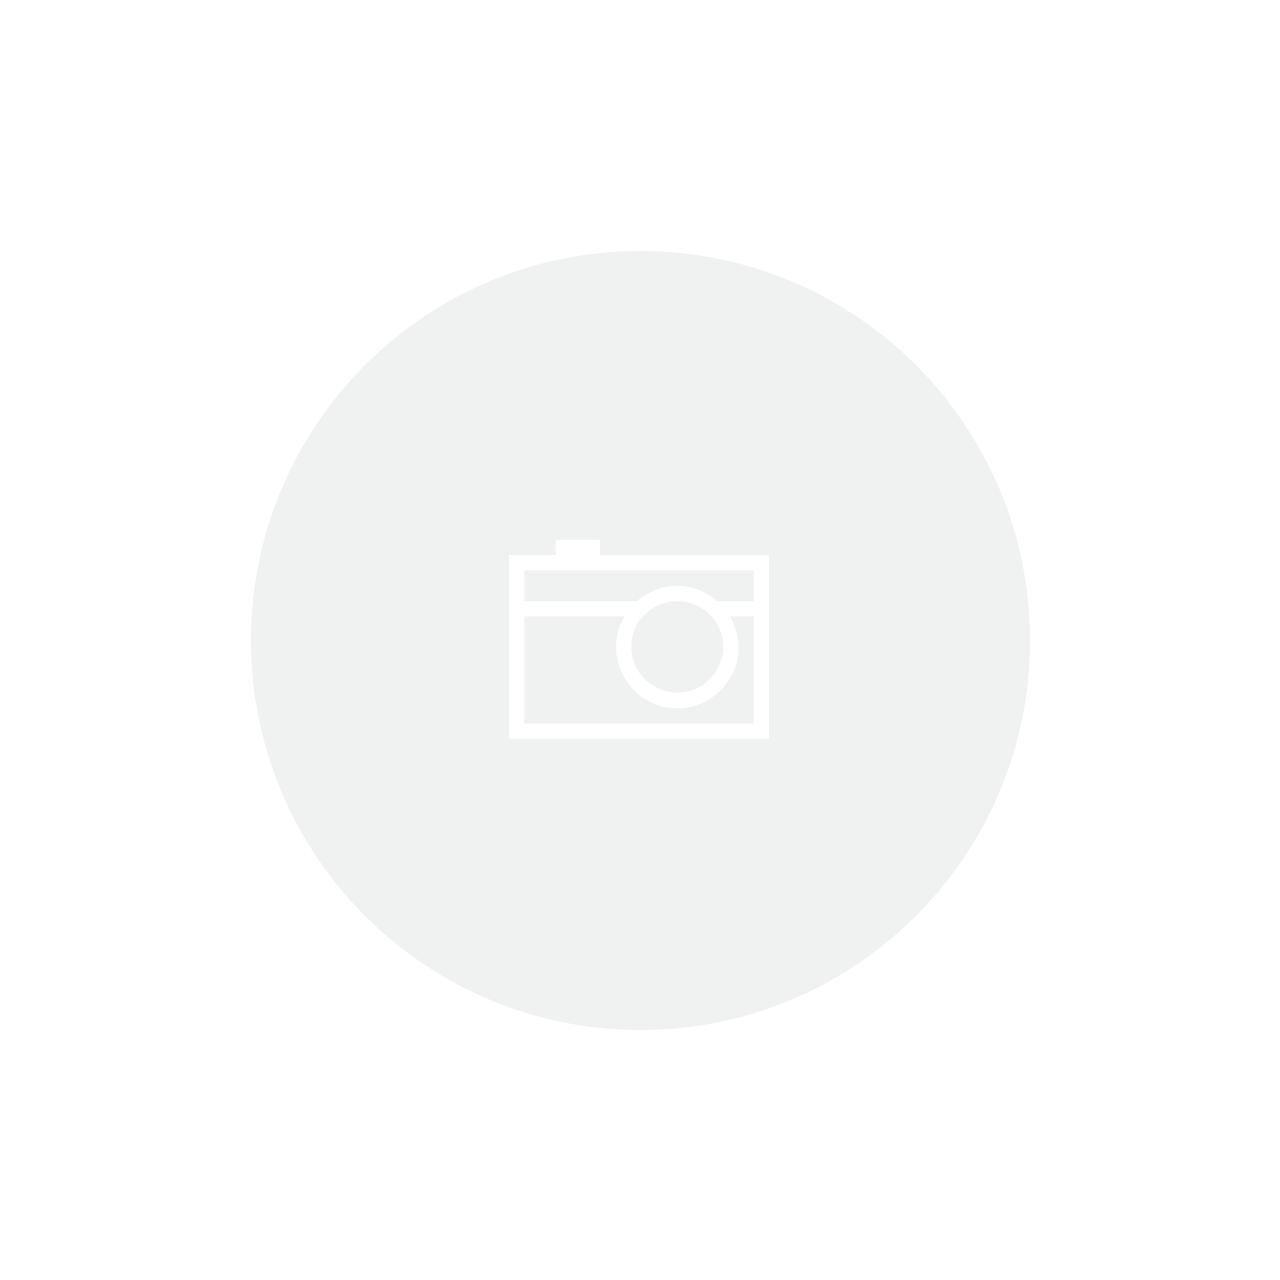 BICICLETA SPEED SOUL TTR1 CARBON 22V DURA ACE (CUSTOM)